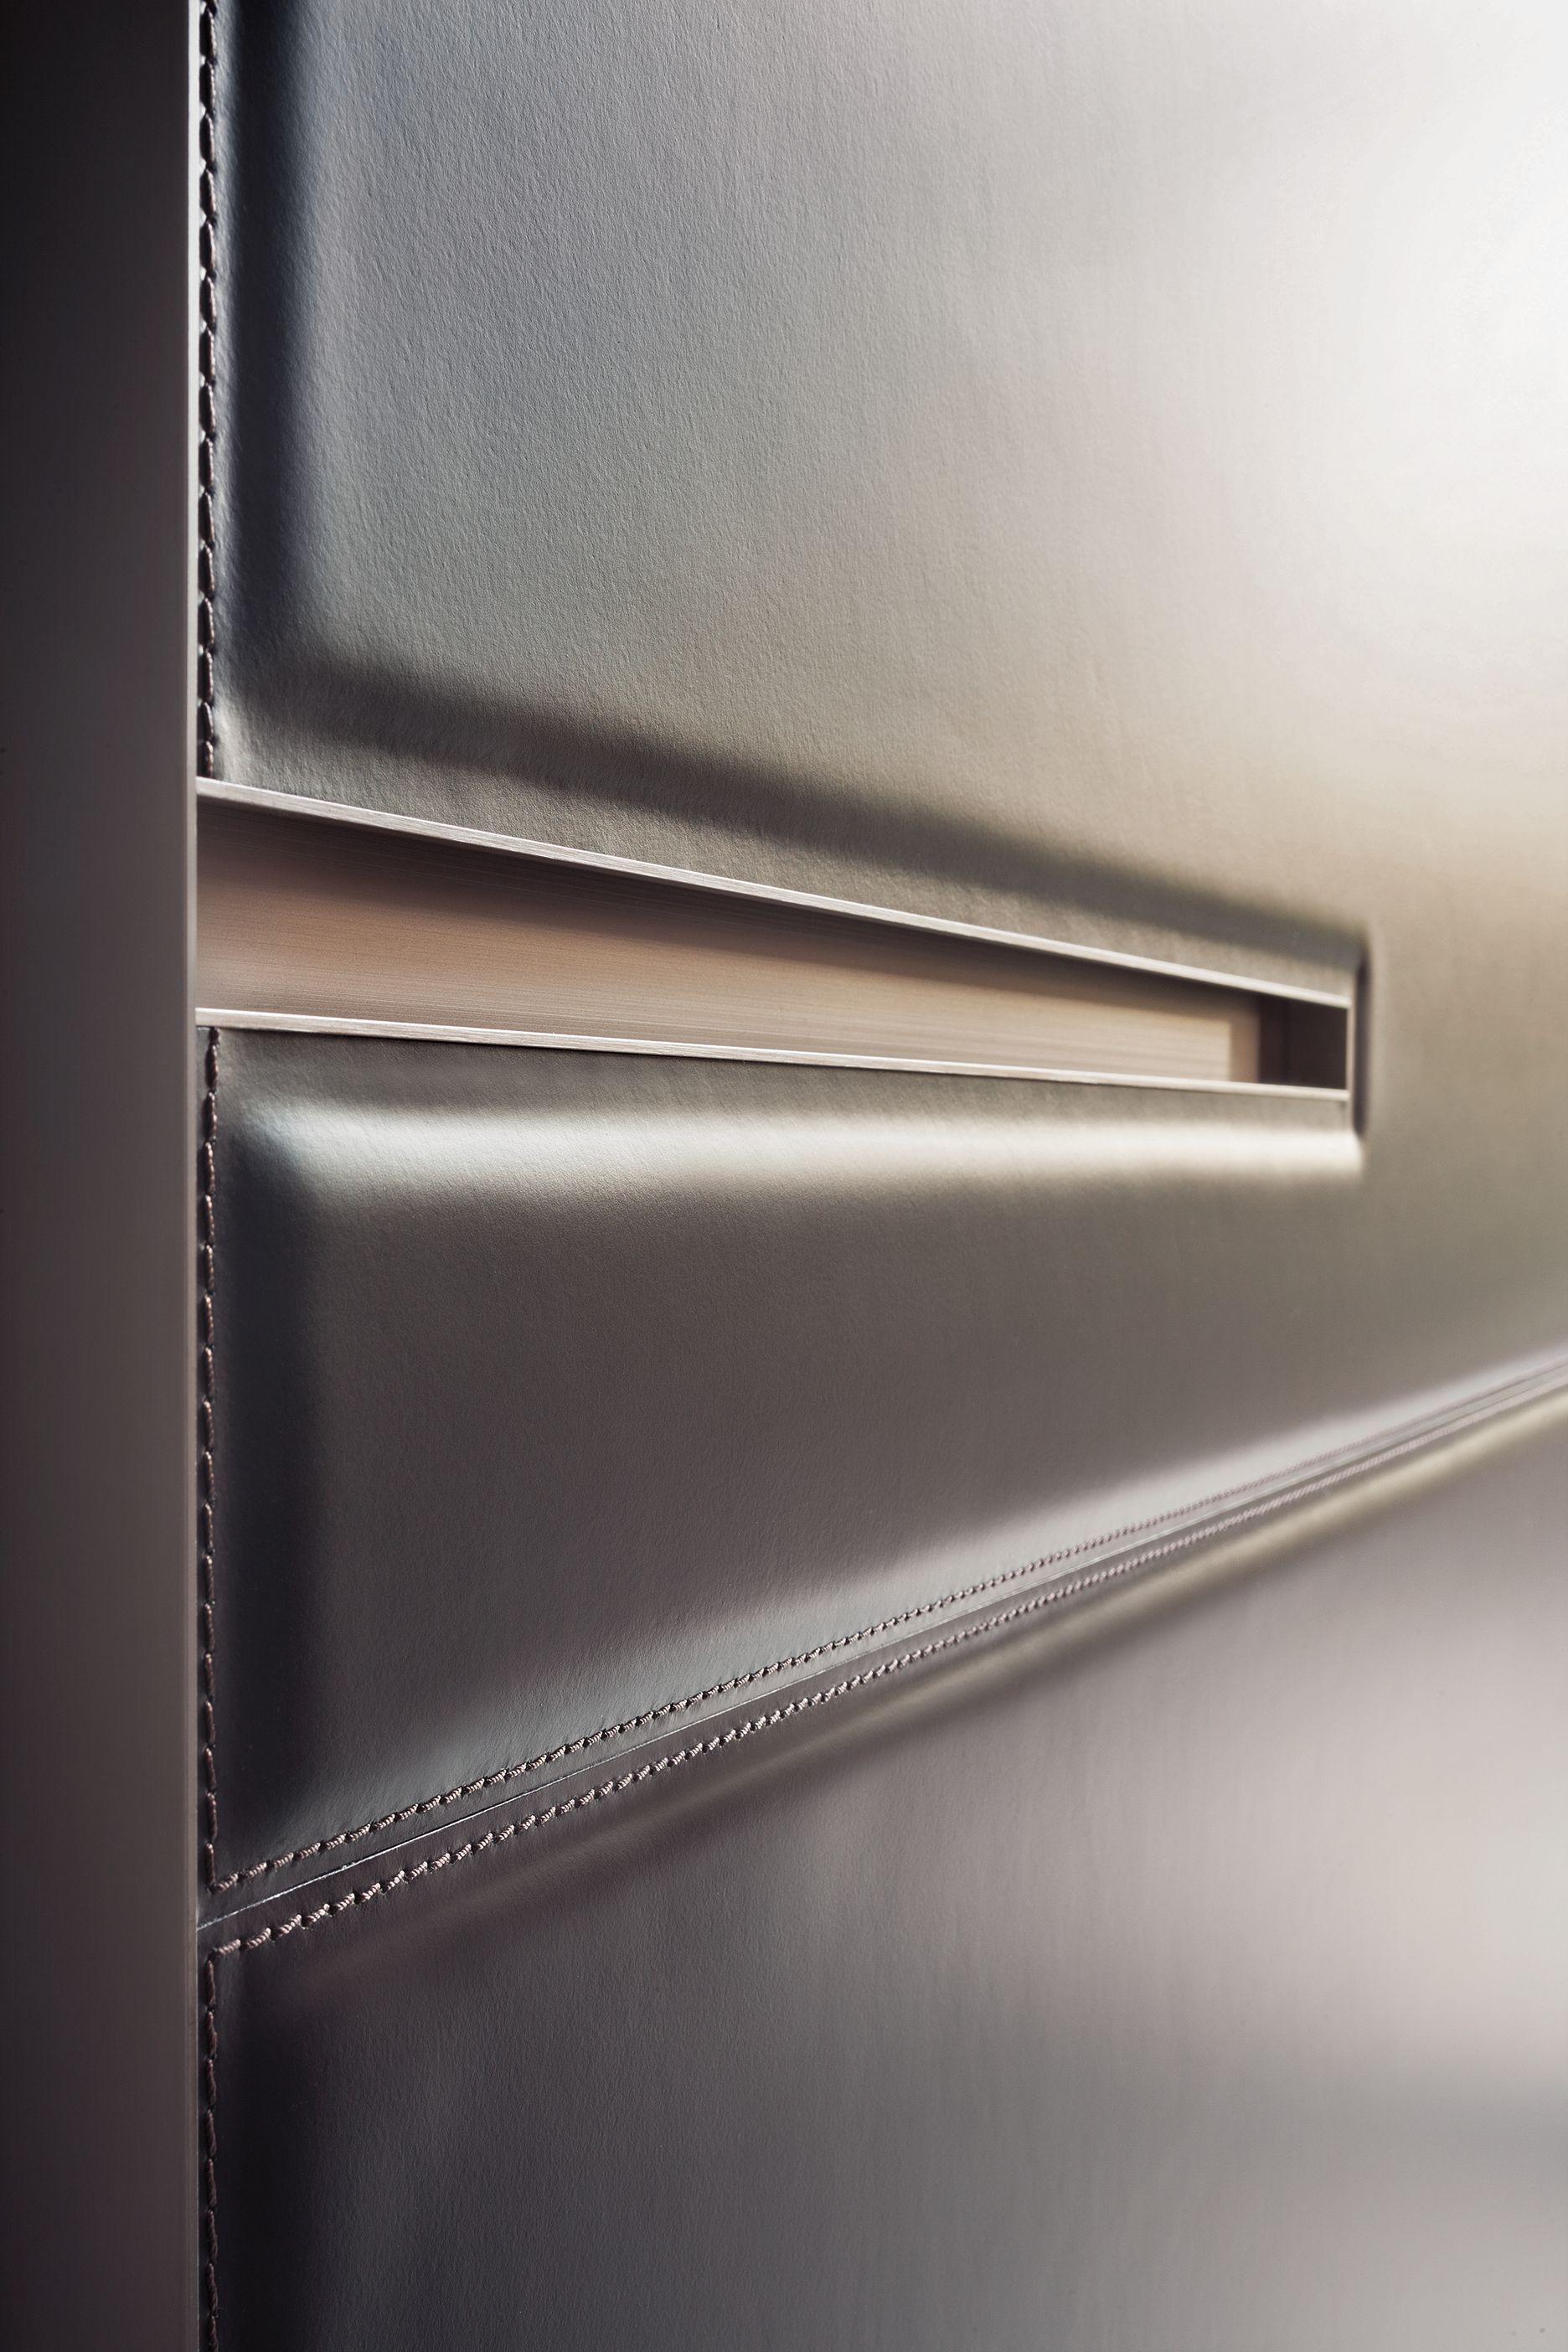 True Italian Elegance Luxurious Leather Finished Coplanar Doors In The Armadio Al Centimetro Wardrobe Ra Joinery Details Furniture Details Interior Furniture